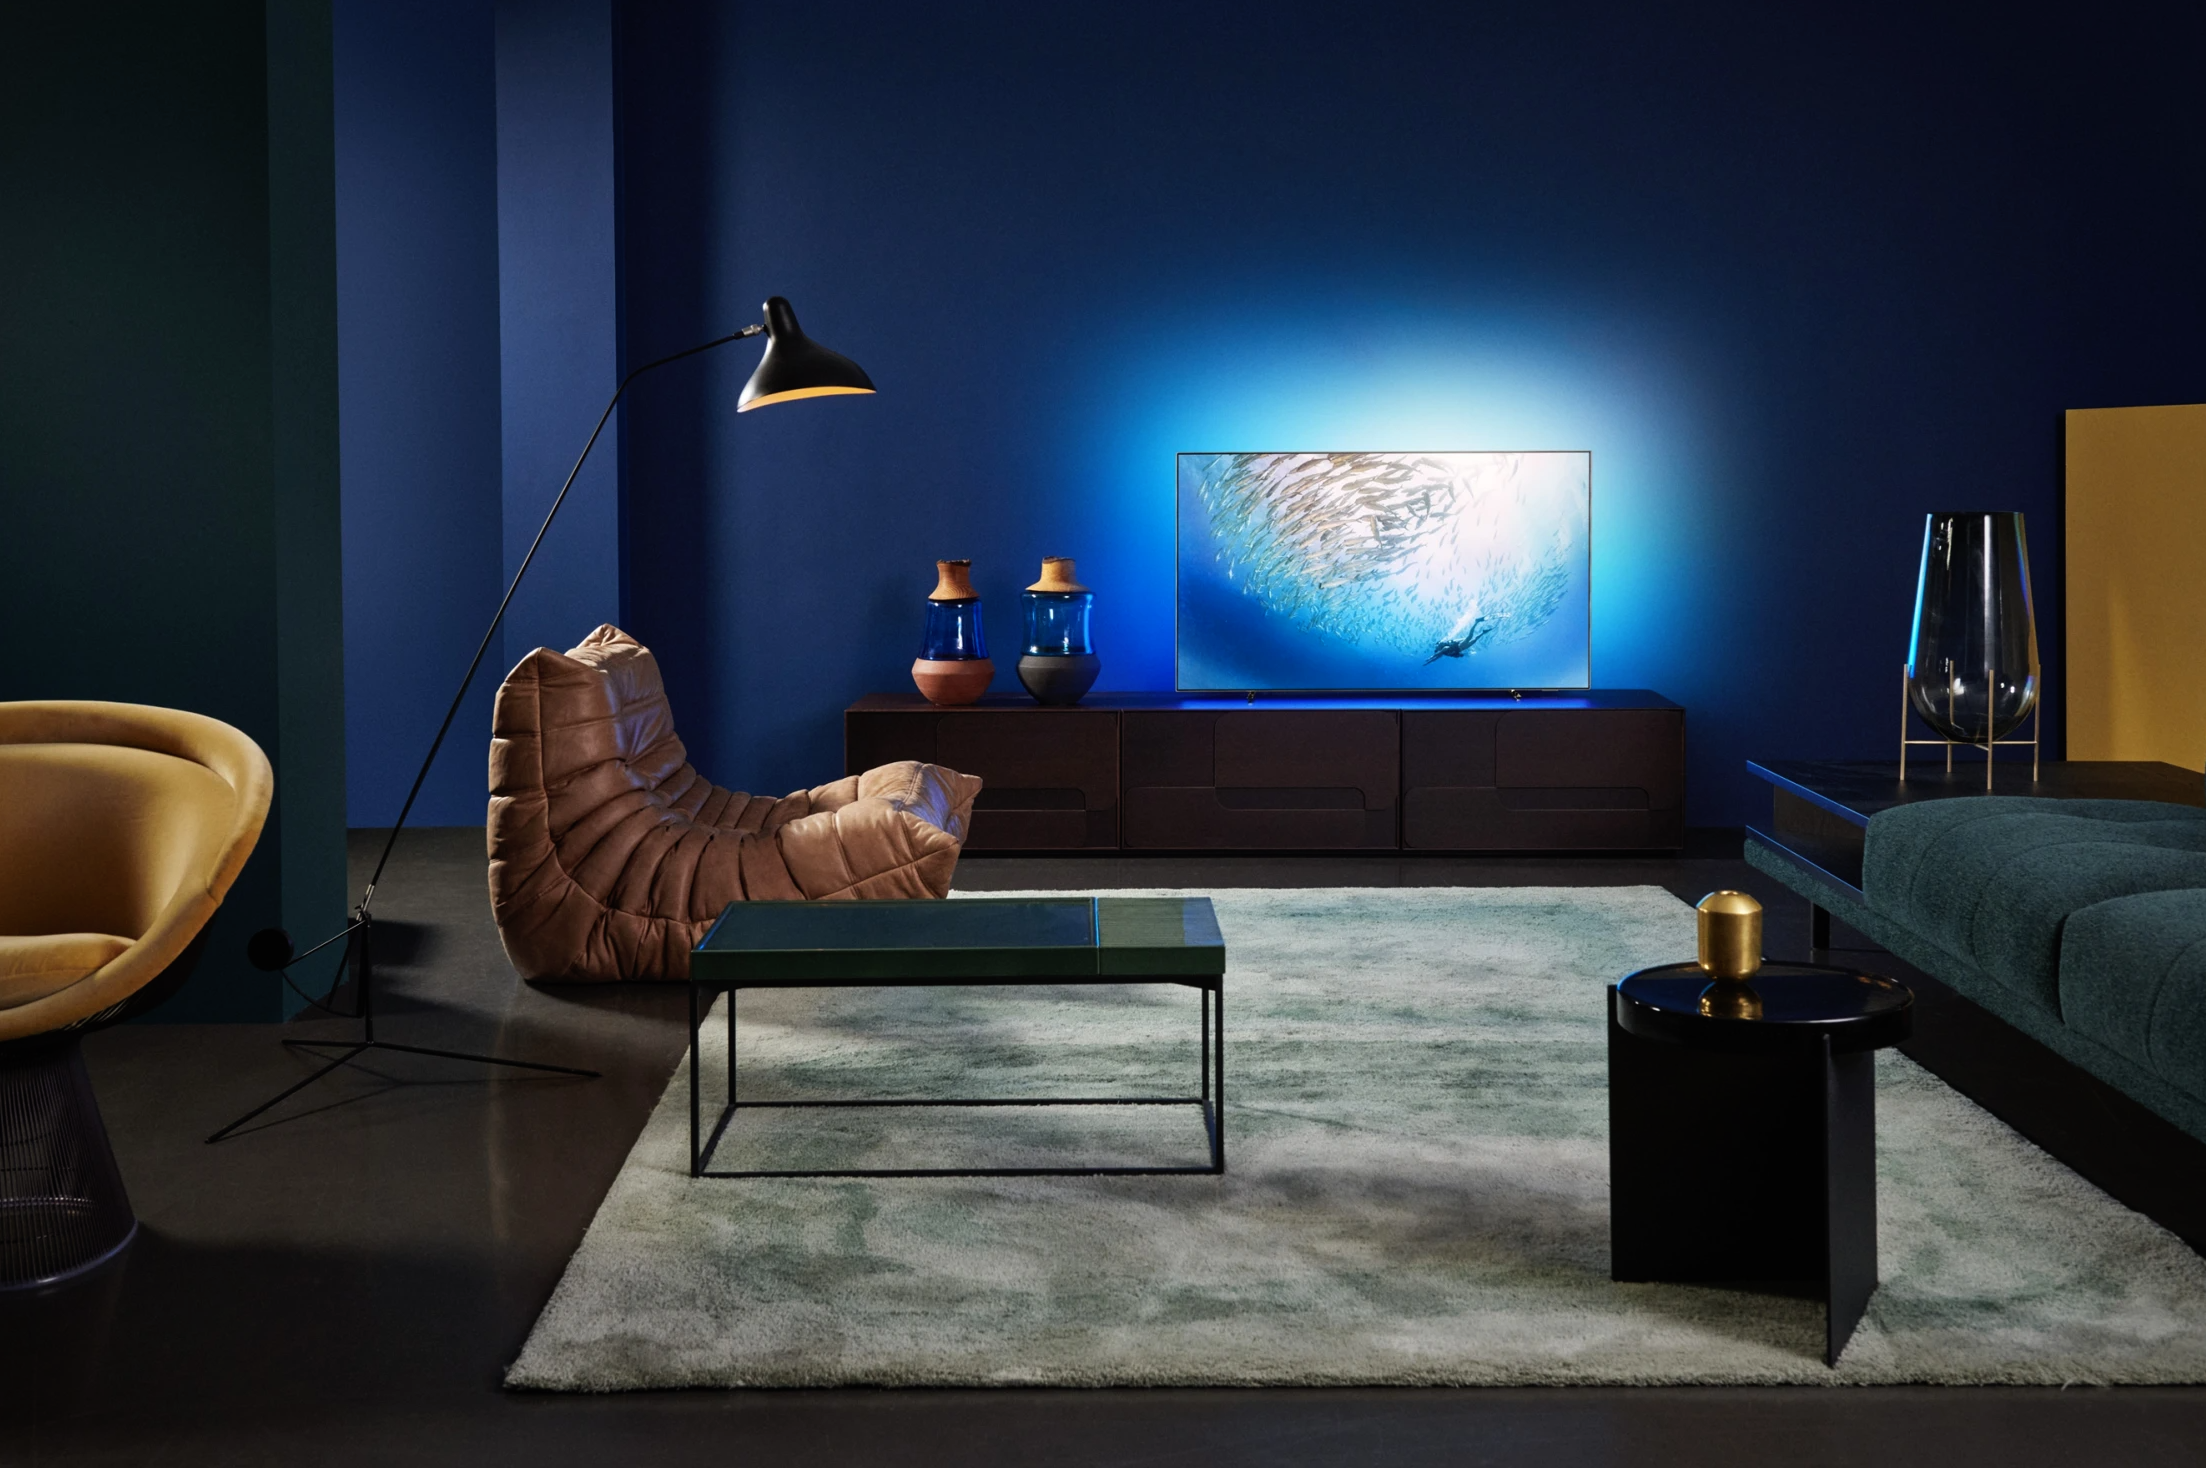 Nieuwe premium oled tv's OLED805 en OLED855 van Philips vanaf juli in winkels